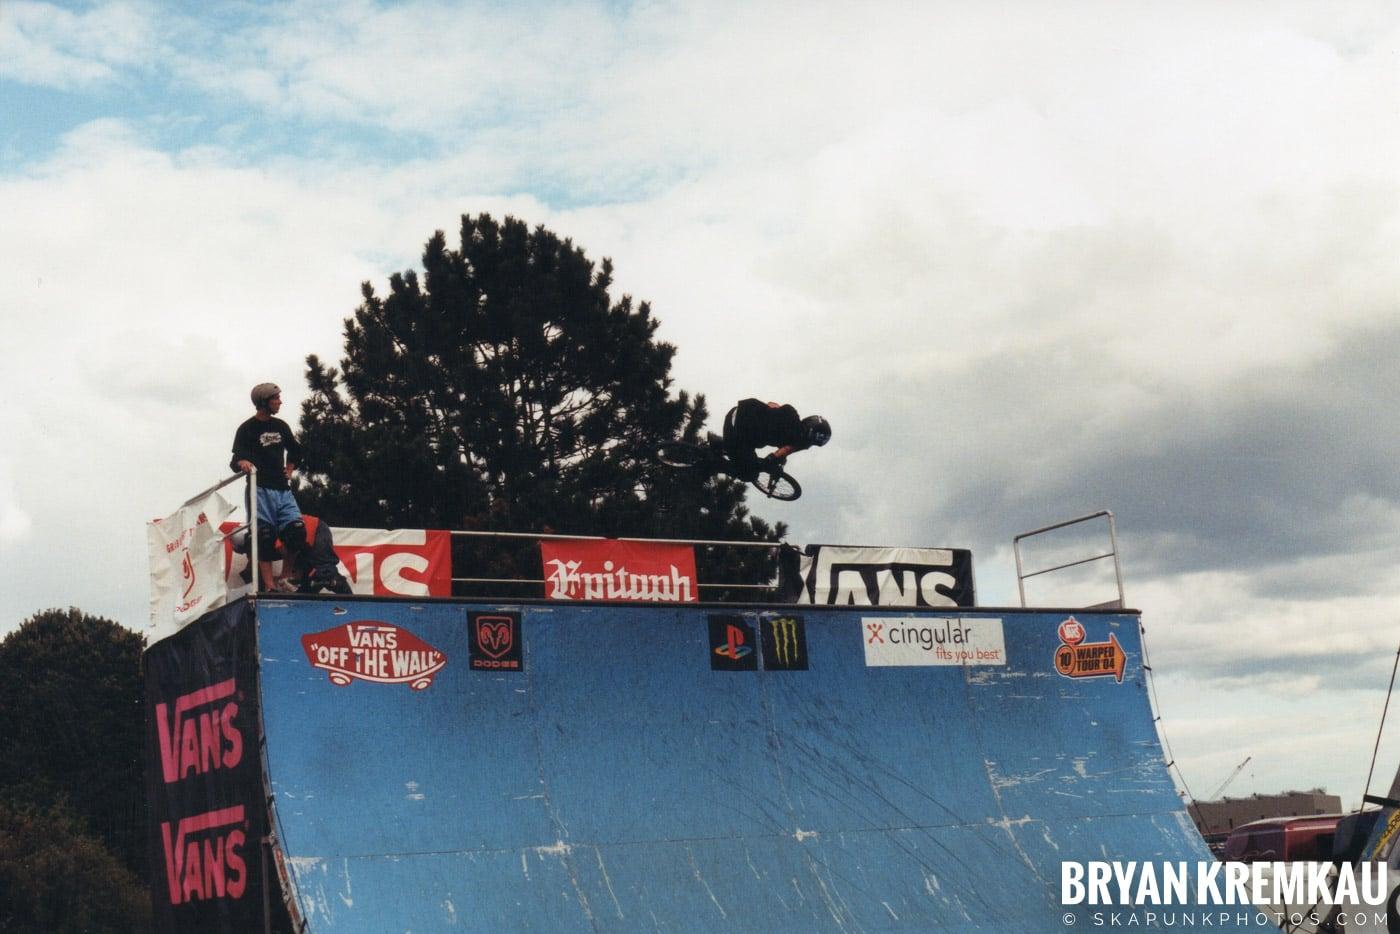 Skaters @ Vans Warped Tour, Randall's Island, NYC - 8.7.04 (4)